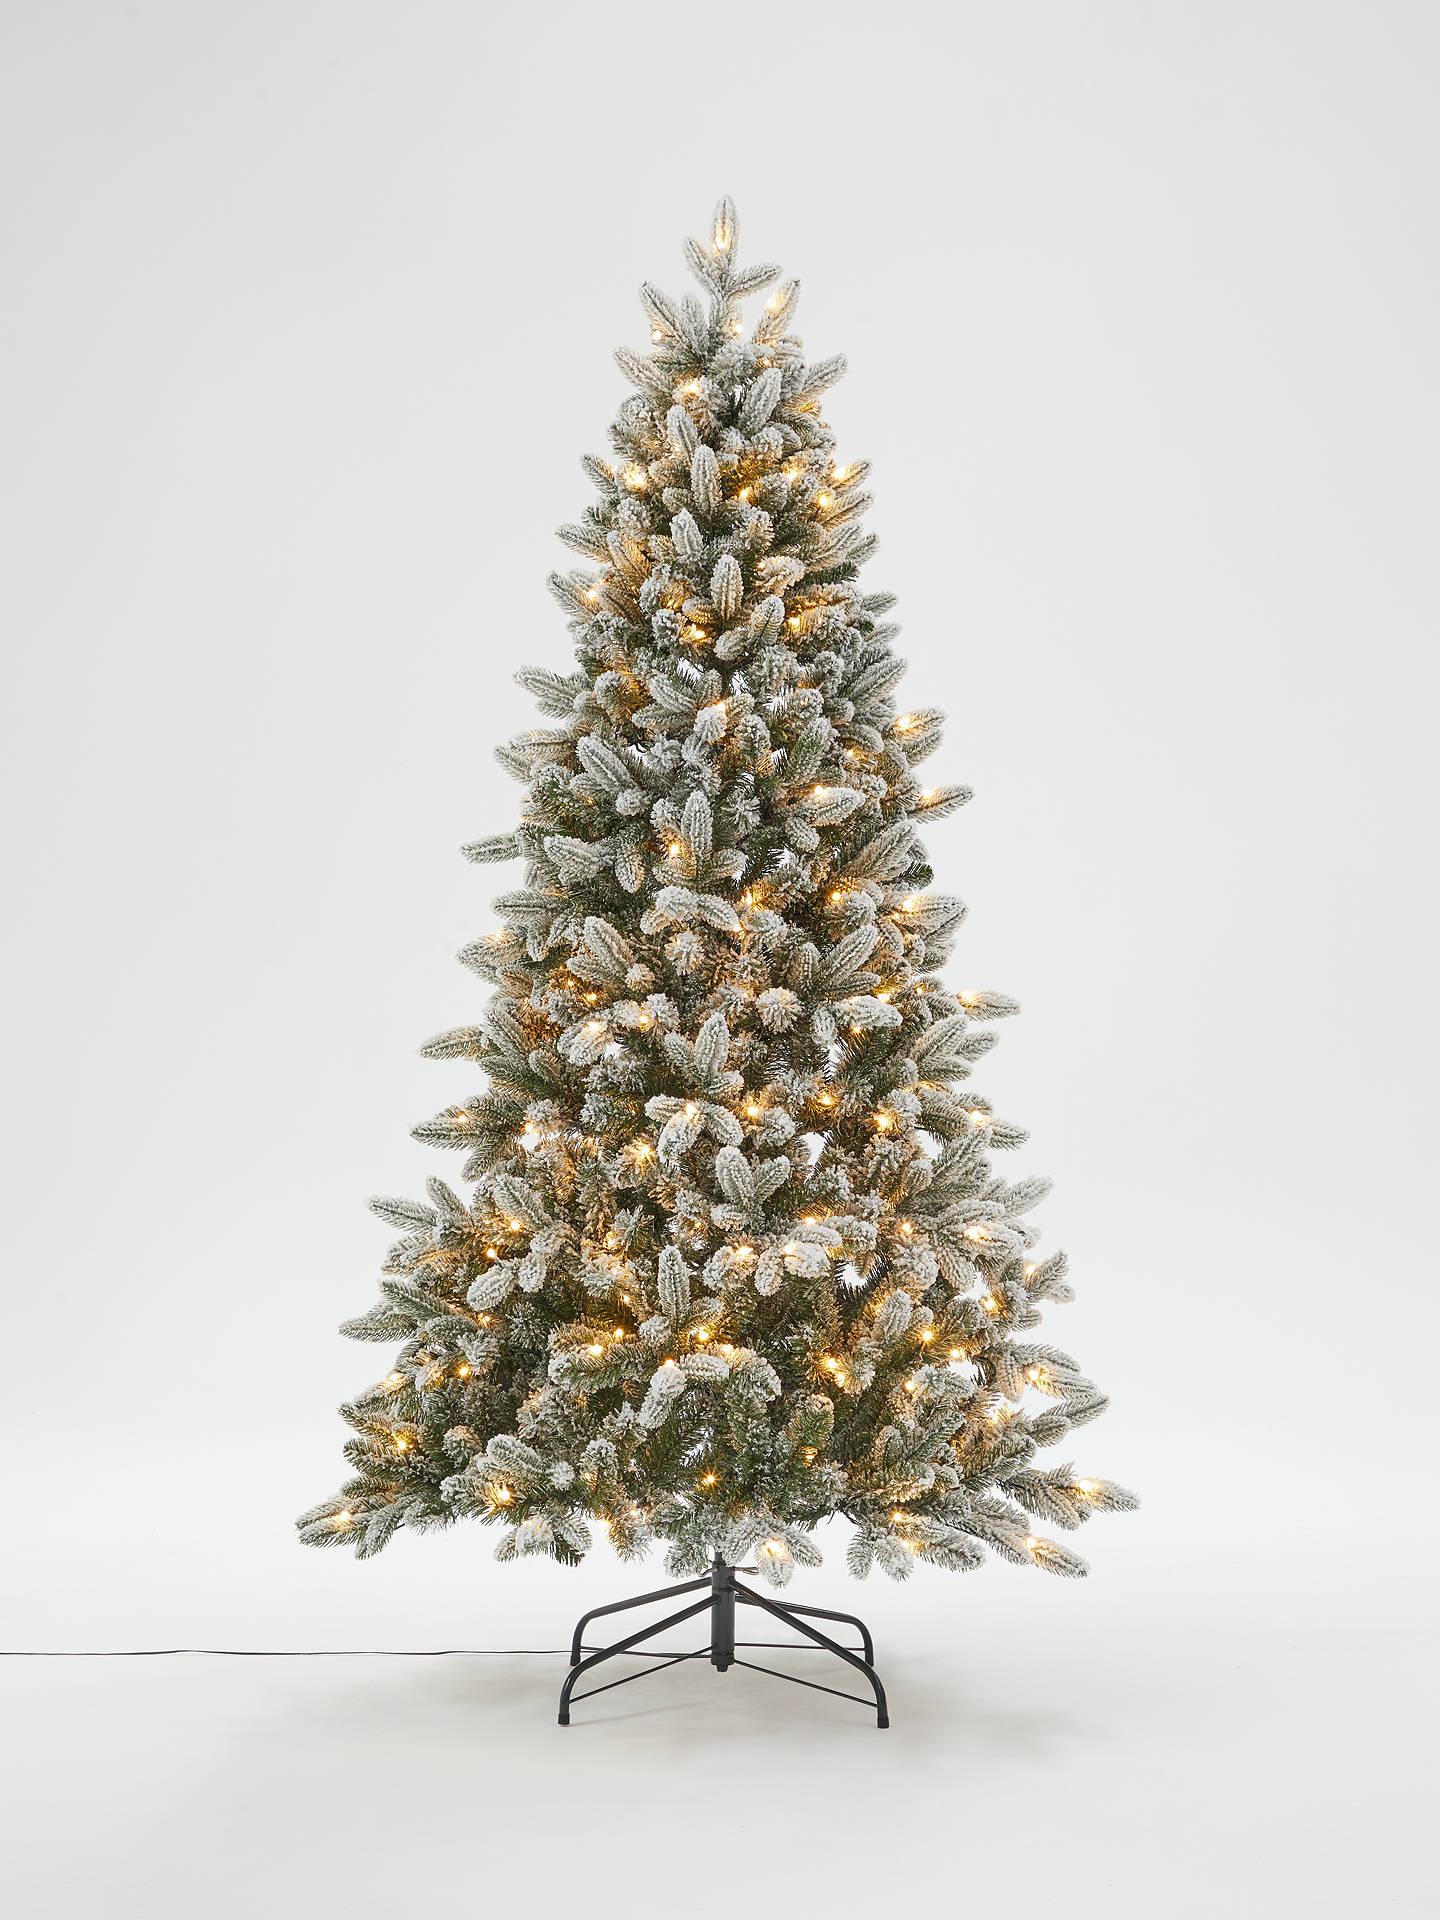 John Lewis & Partners Pre-Lit Snowy Spruce Christmas Tree, 6ft at John Lewis & Partners